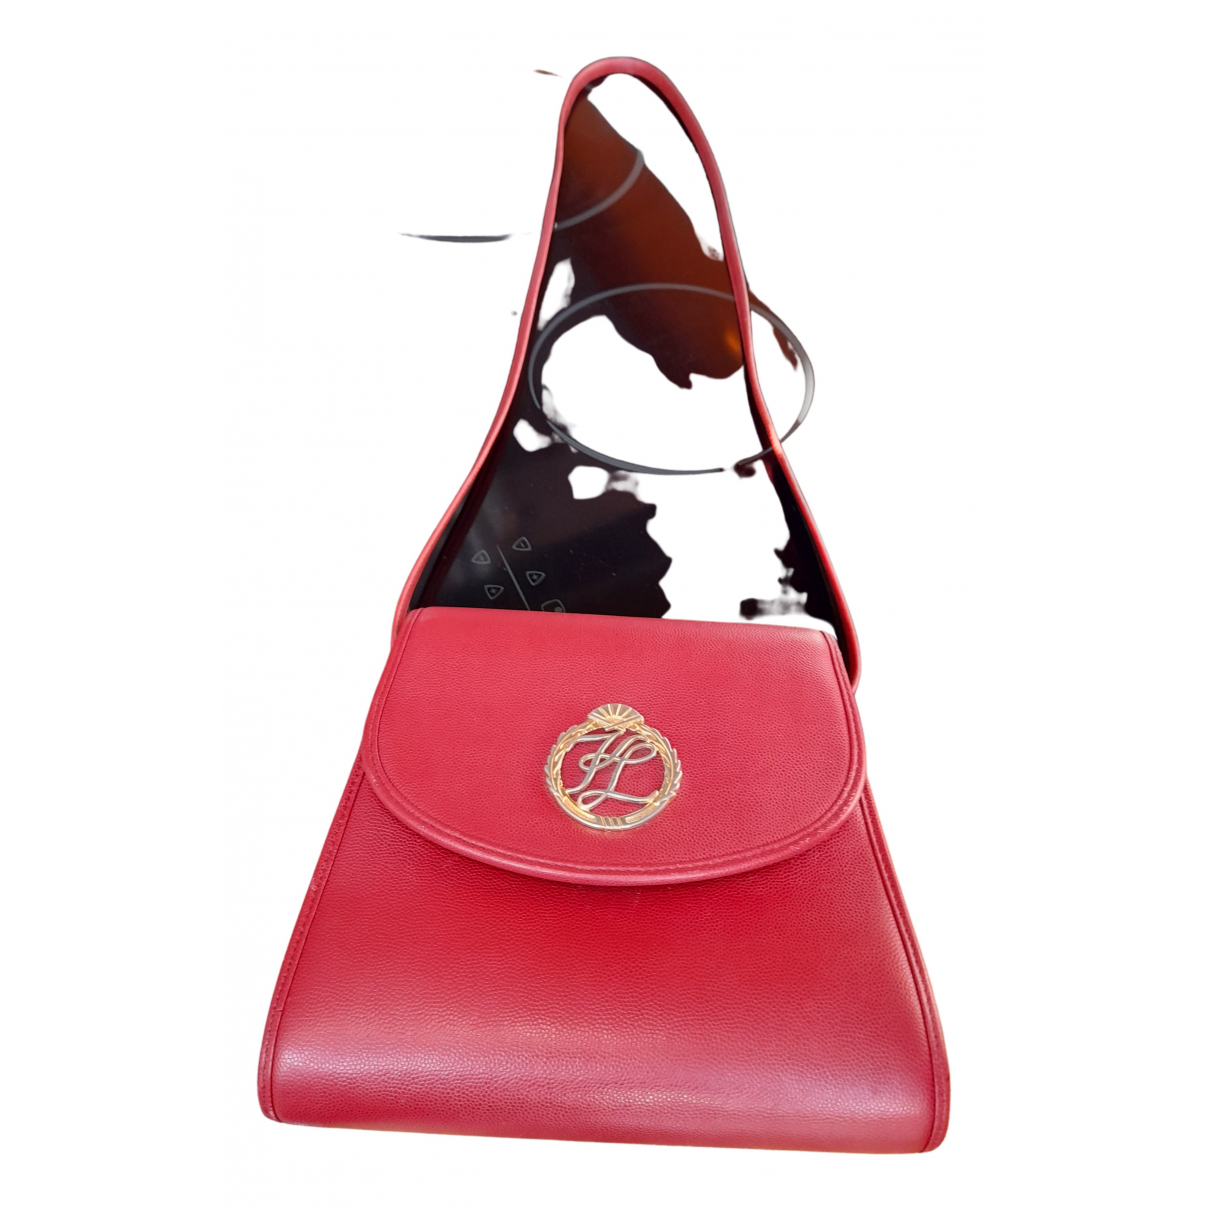 Karl Lagerfeld - Sac a main   pour femme en cuir - rouge